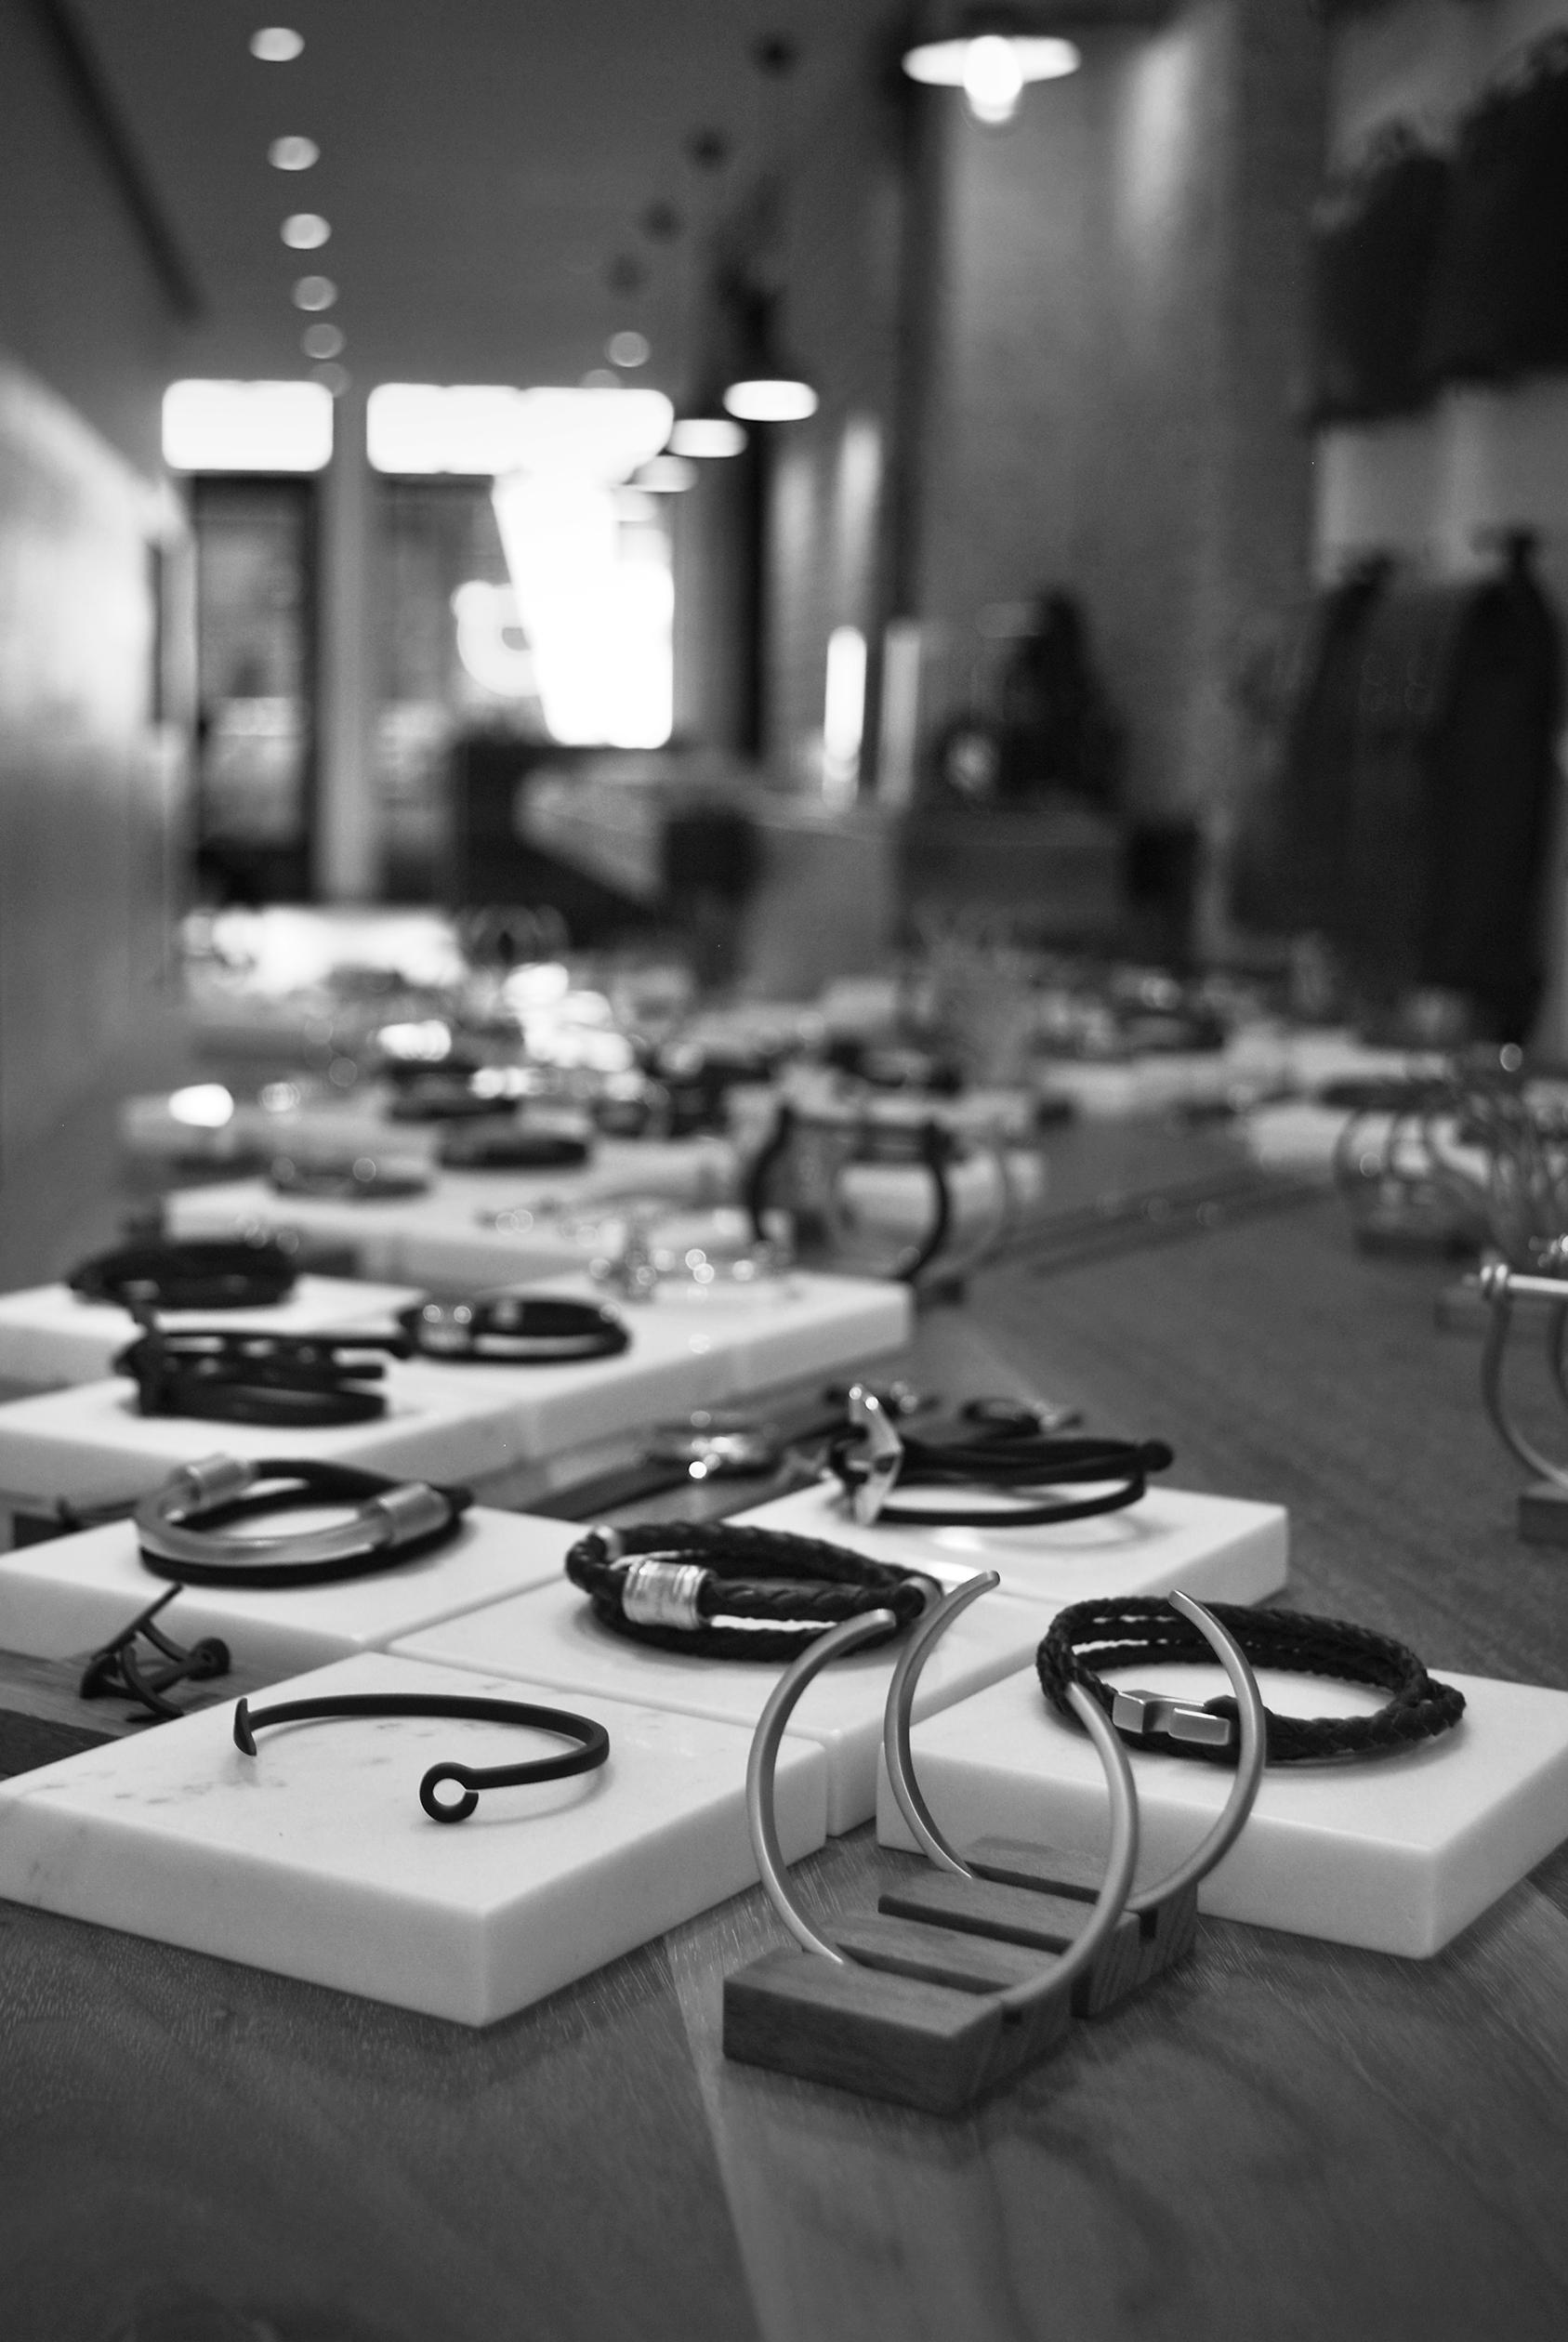 A table full of bracelets, at Miansai